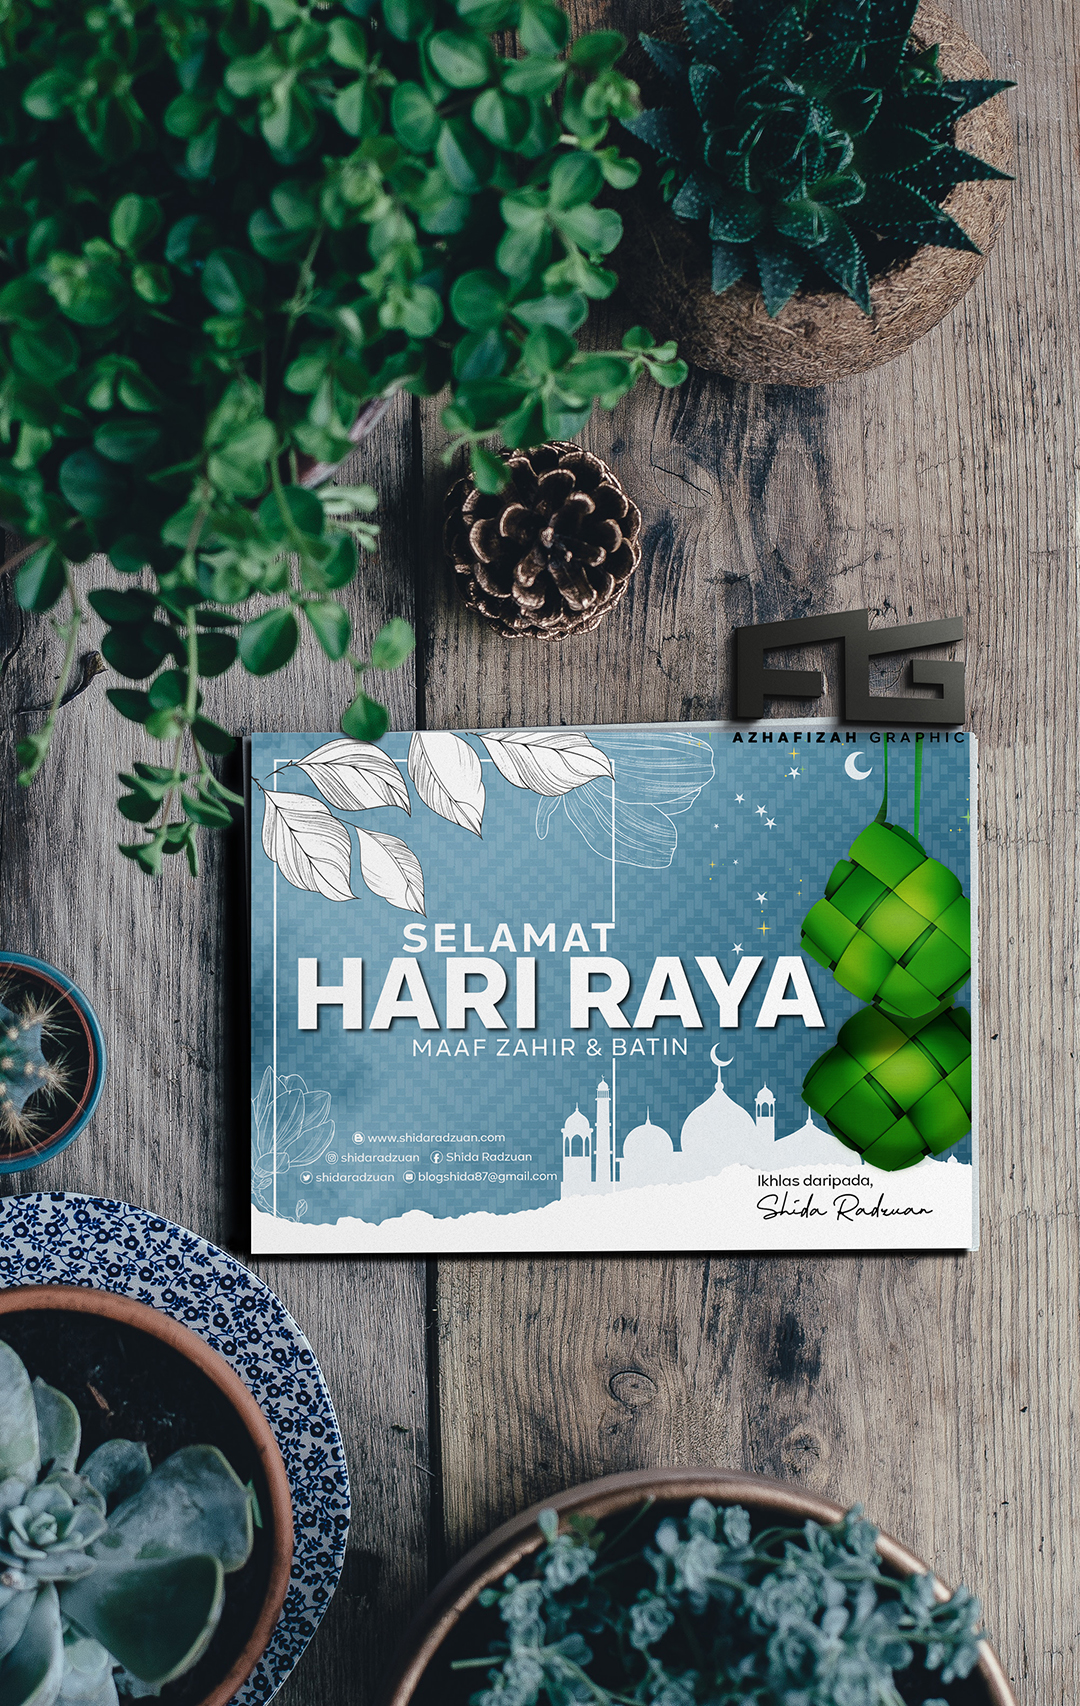 Design Kad Raya Shid Radzuan